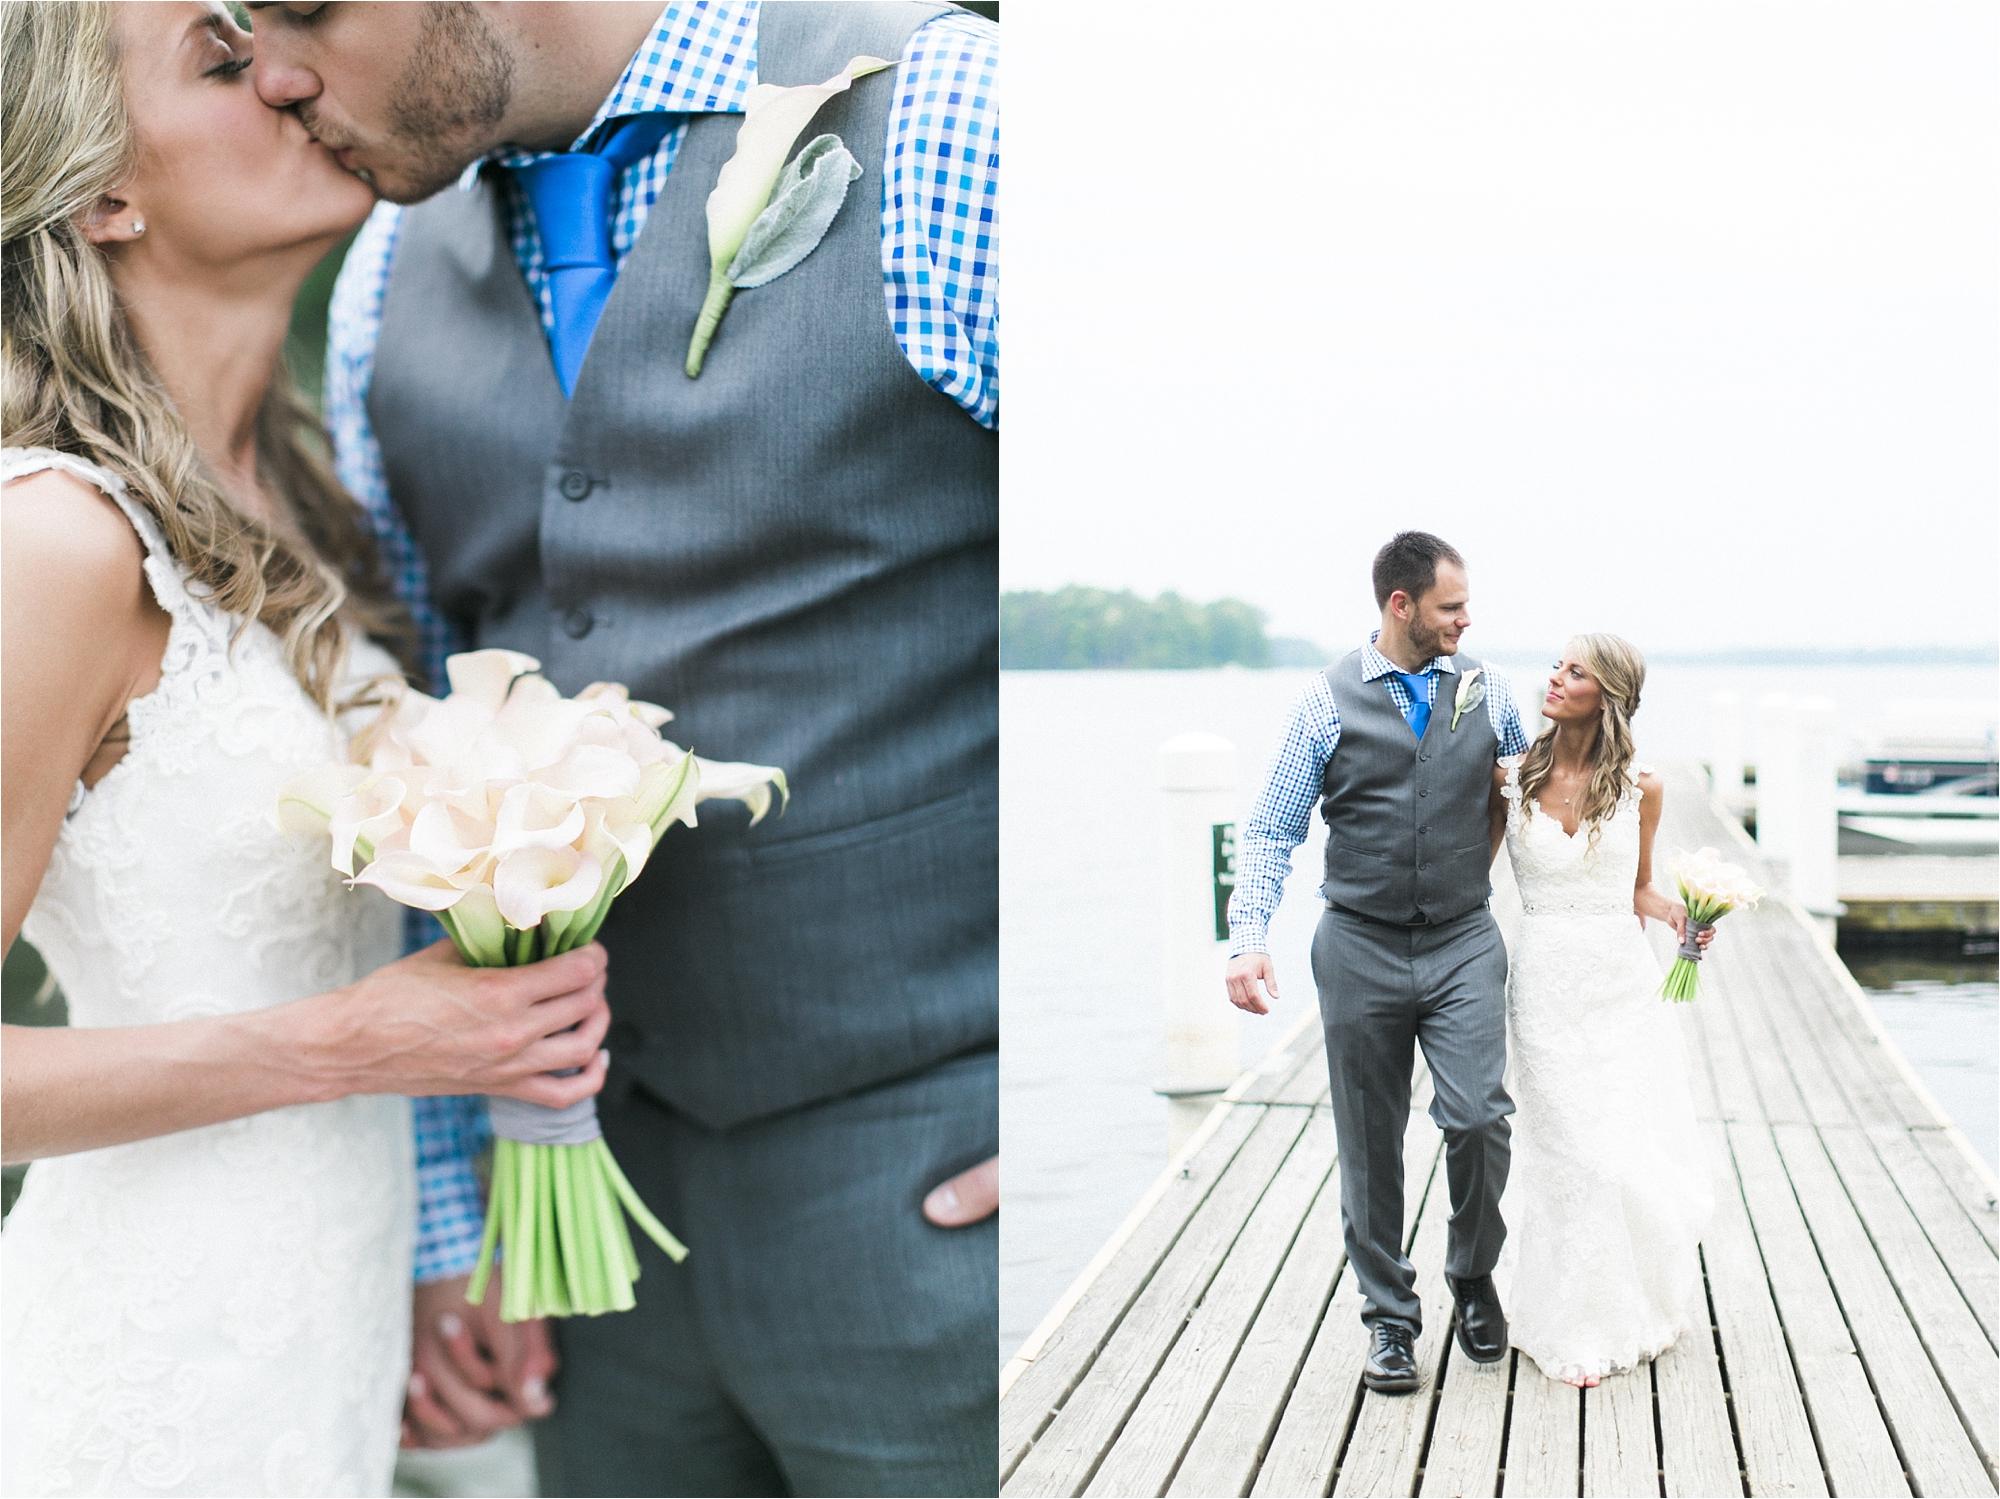 stephanie-yonce-boathouse-sunday-park-virginia-wedding-photo-025.JPG